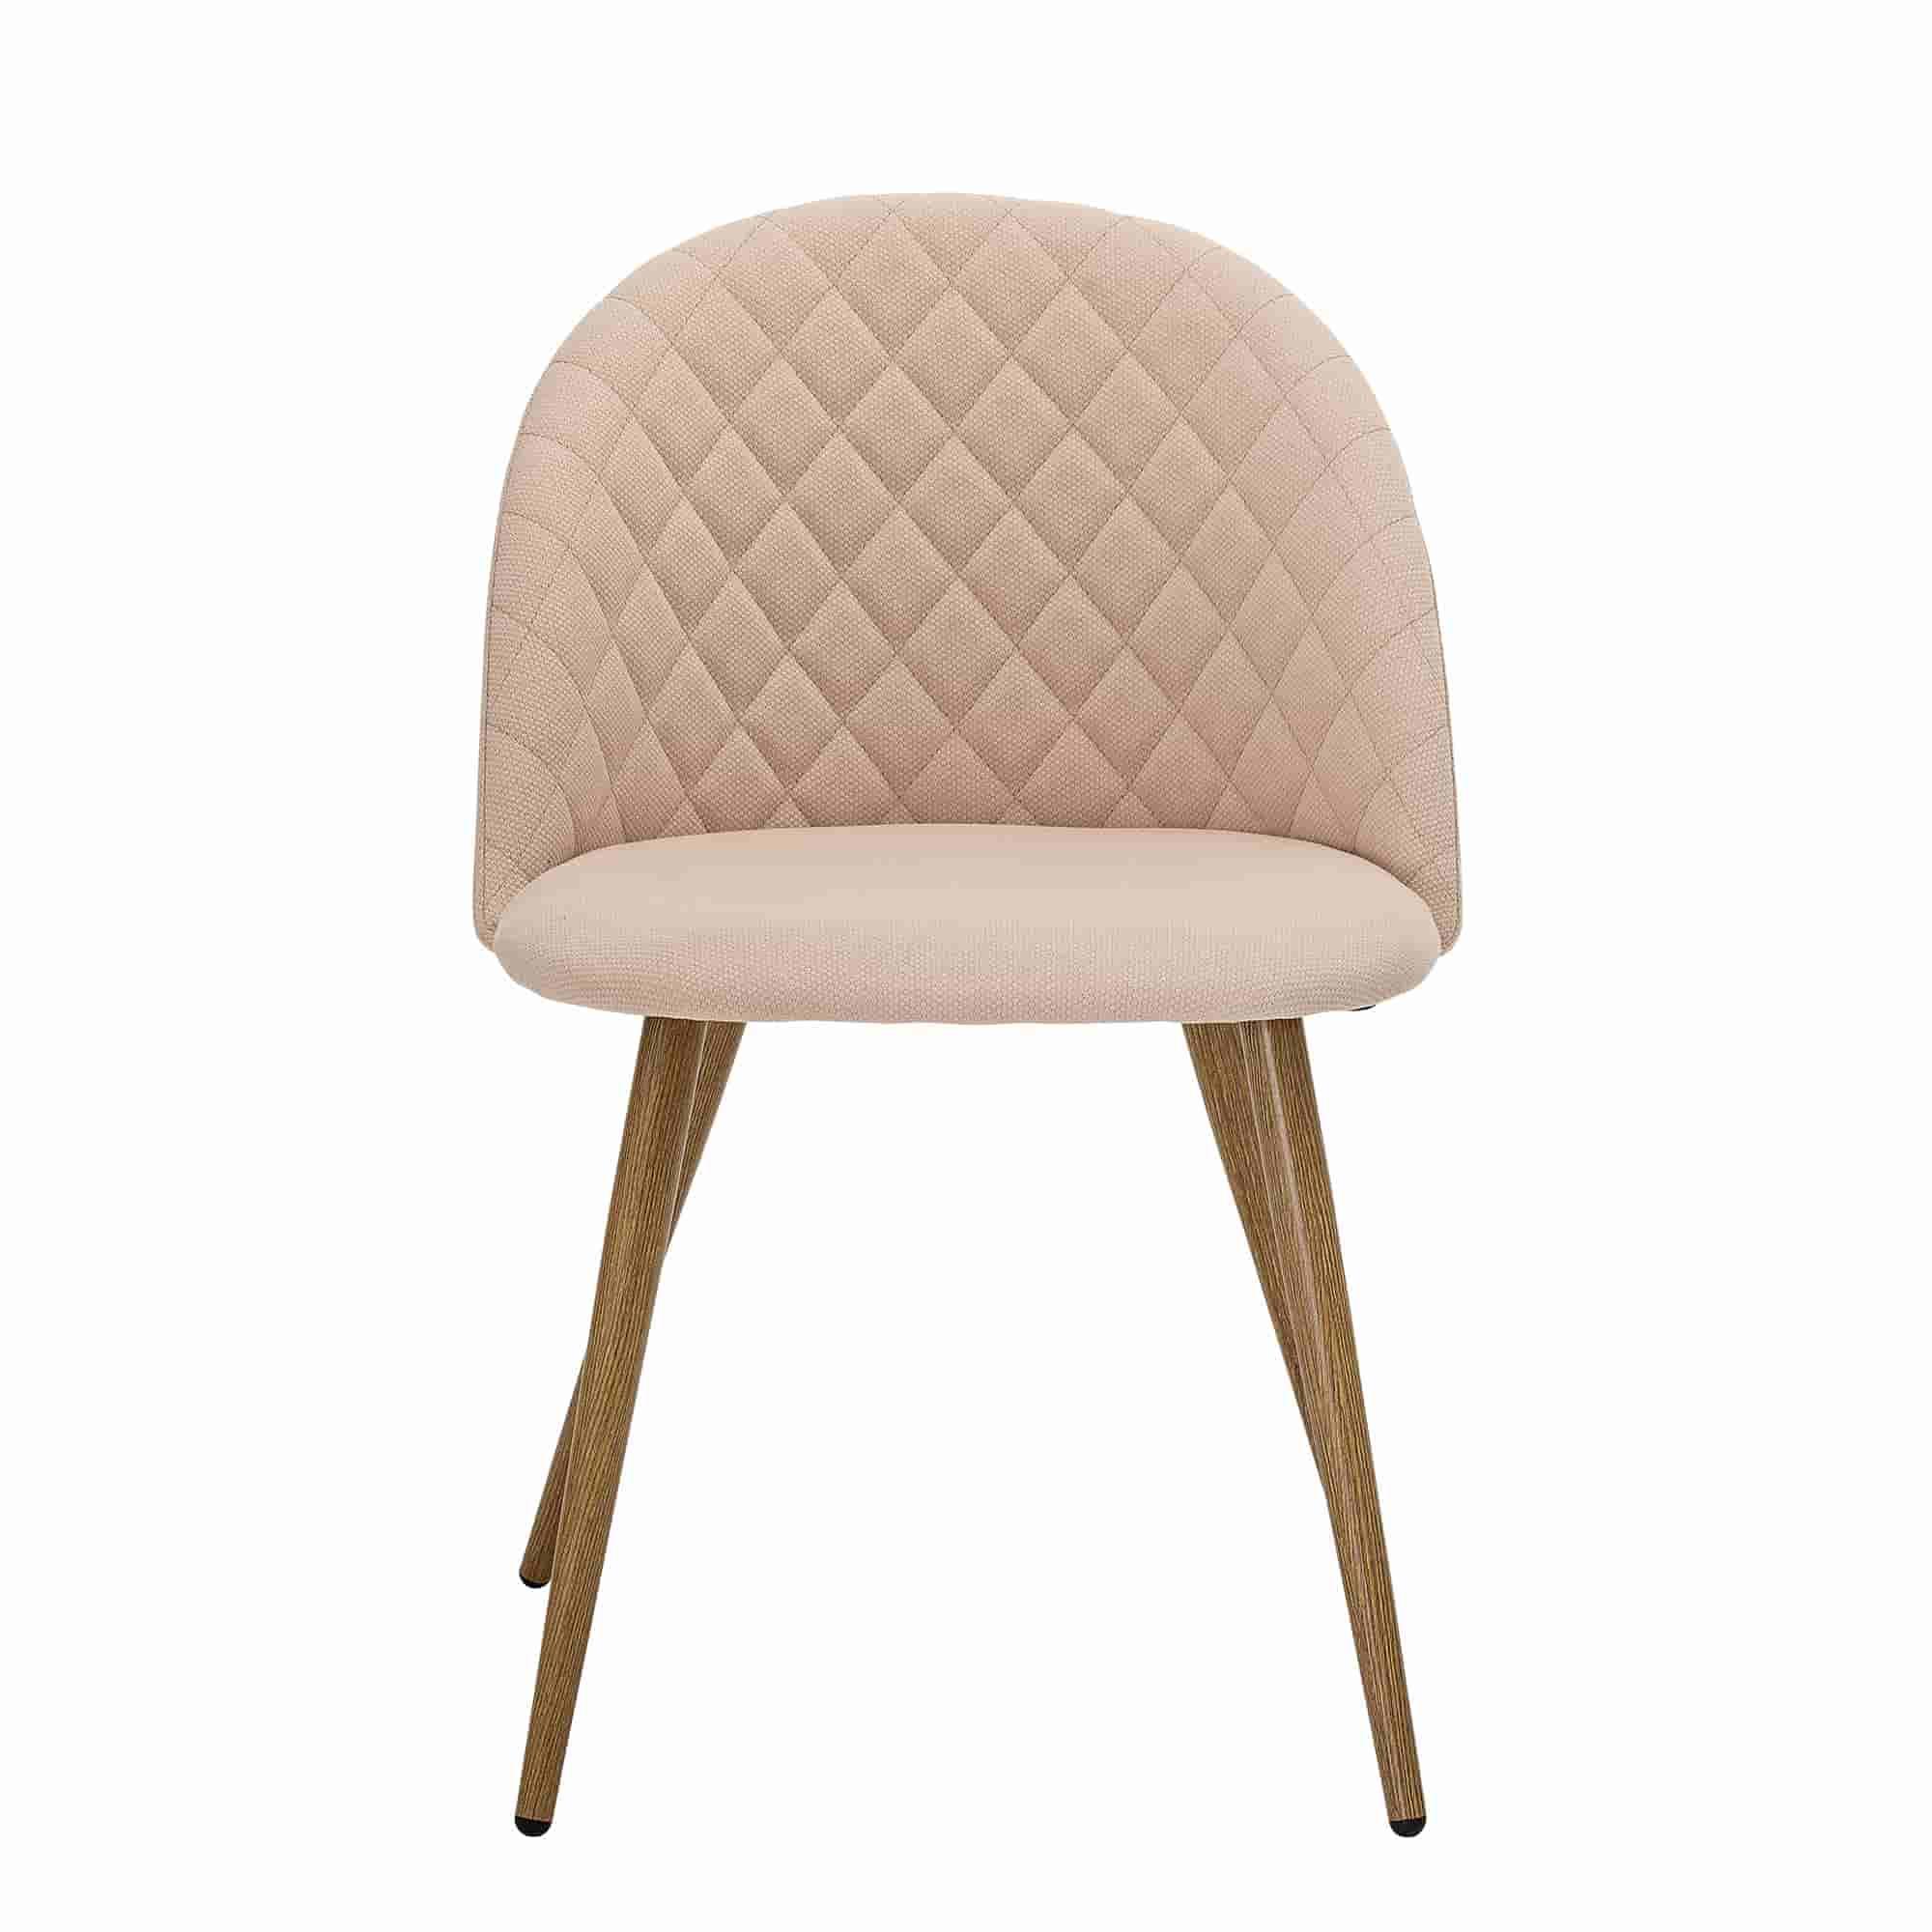 Bloomingville vapor spisebordsstol - rosa/natur polyester/metal fra bloomingville på boboonline.dk